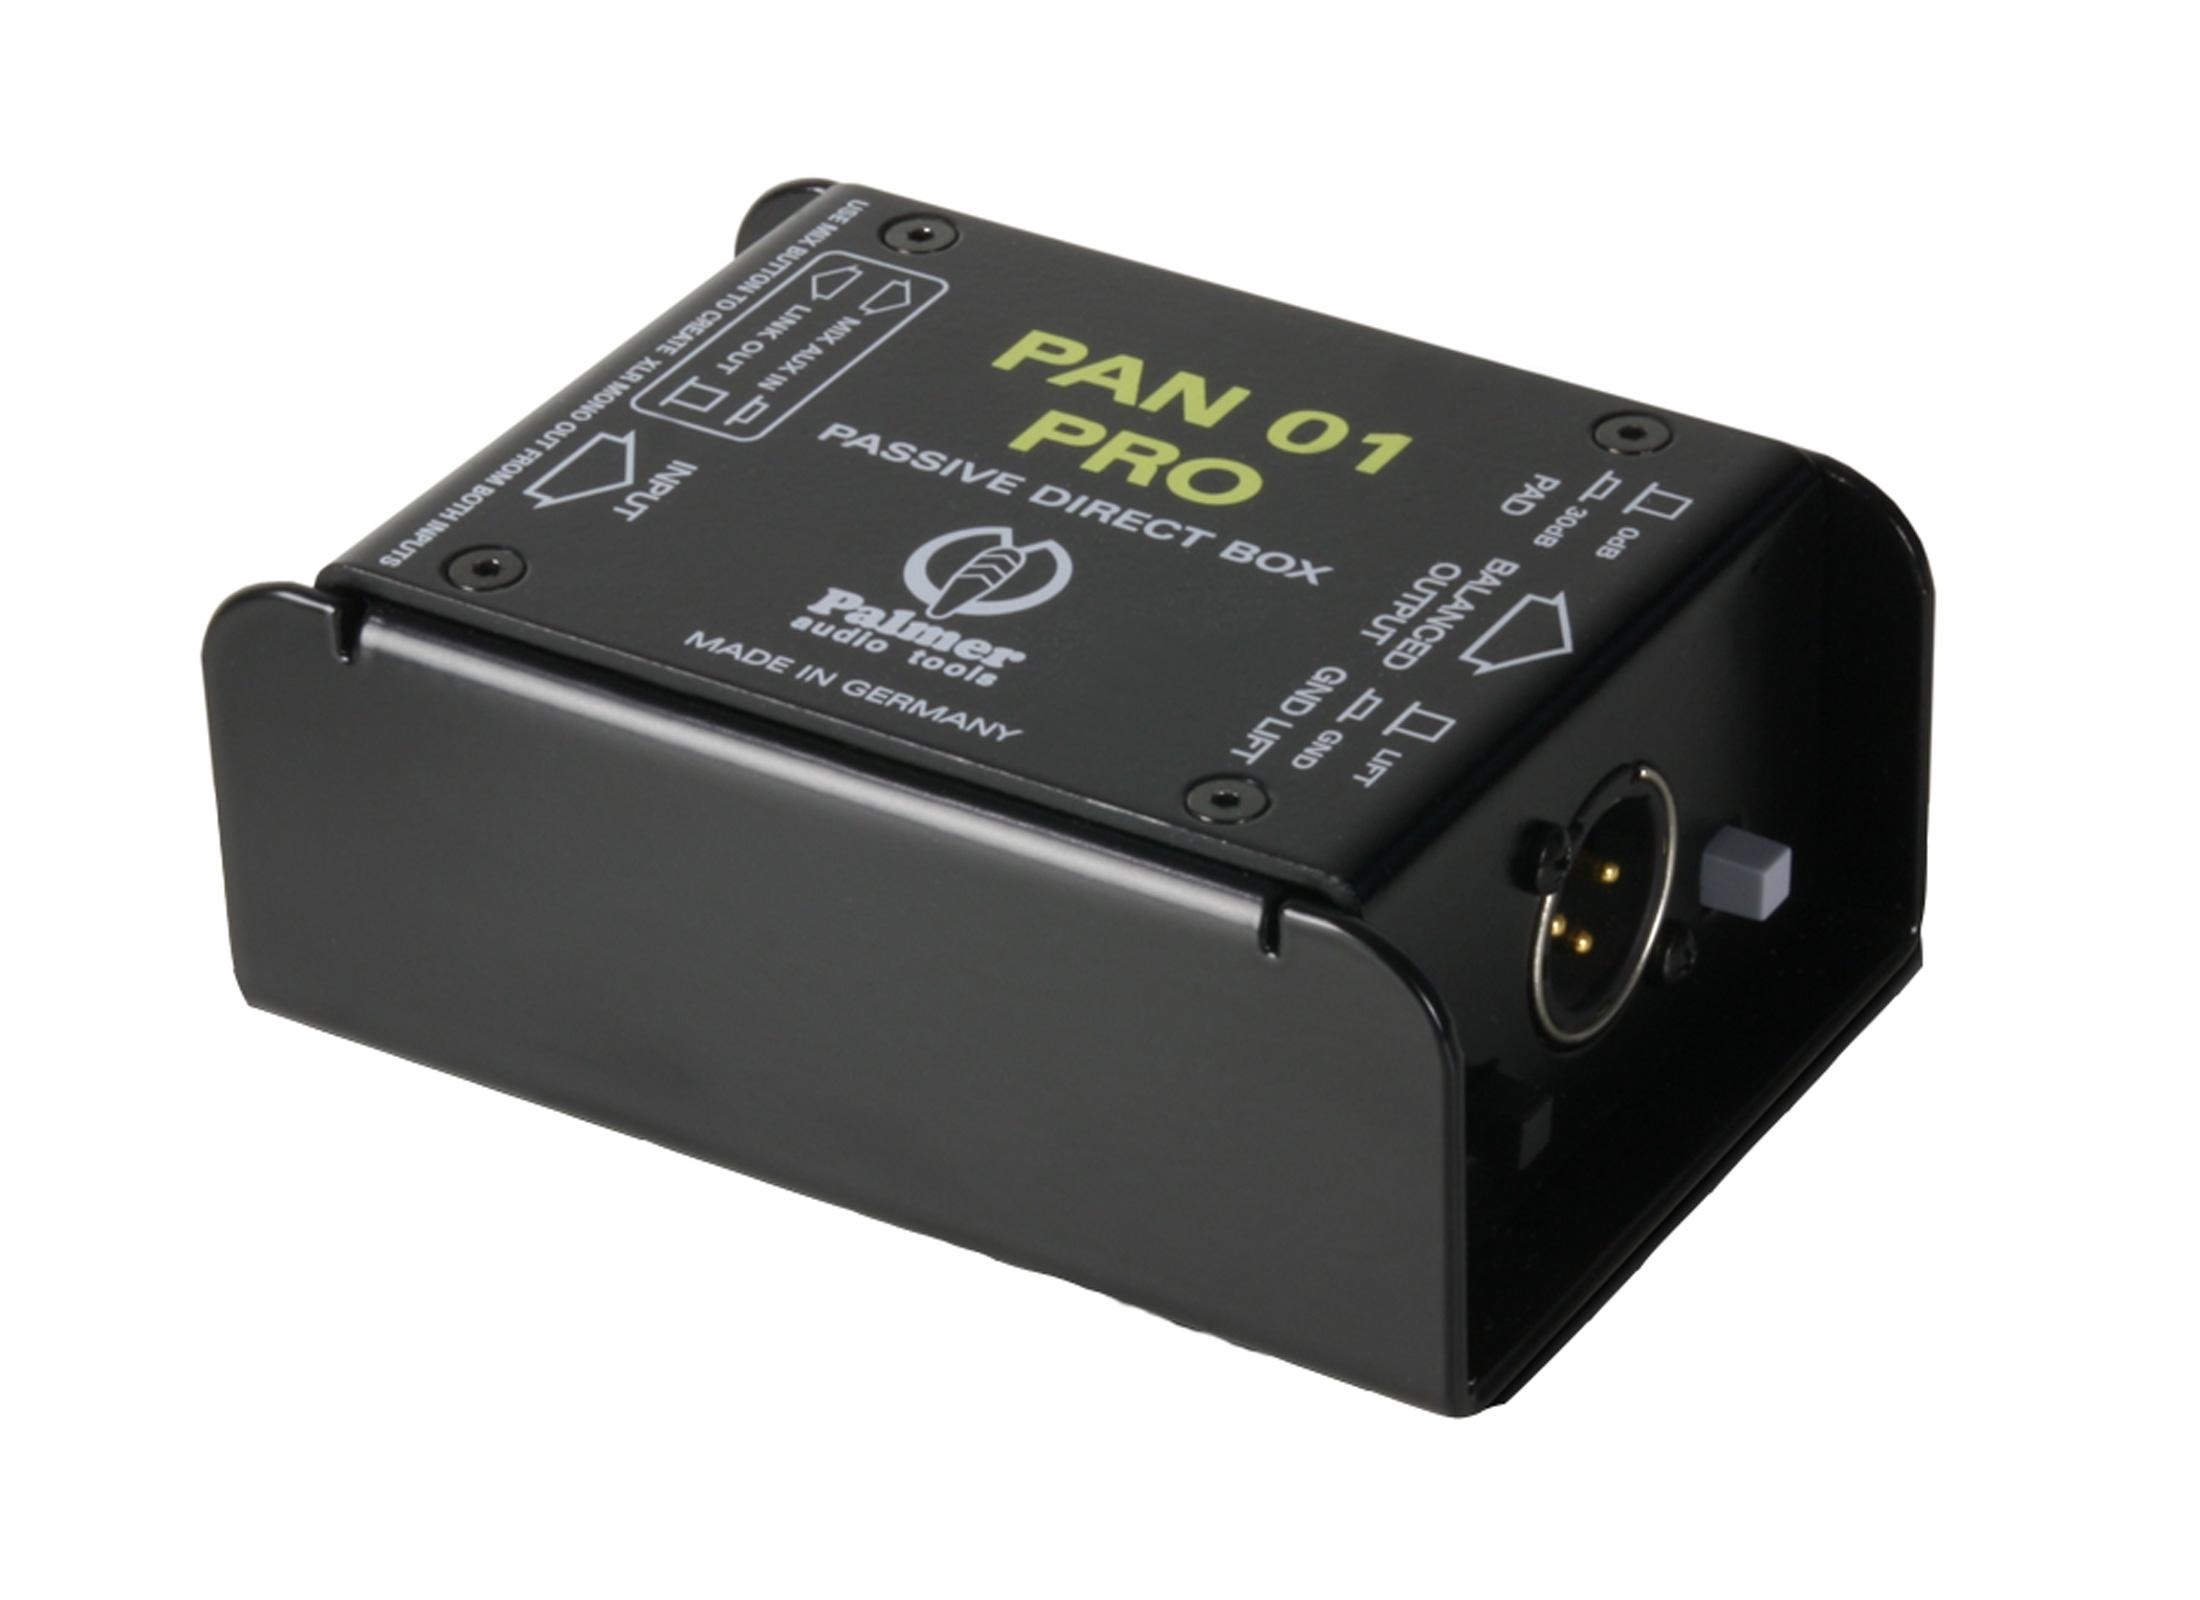 palmer pan 01 passive di speaker online at low prices at. Black Bedroom Furniture Sets. Home Design Ideas